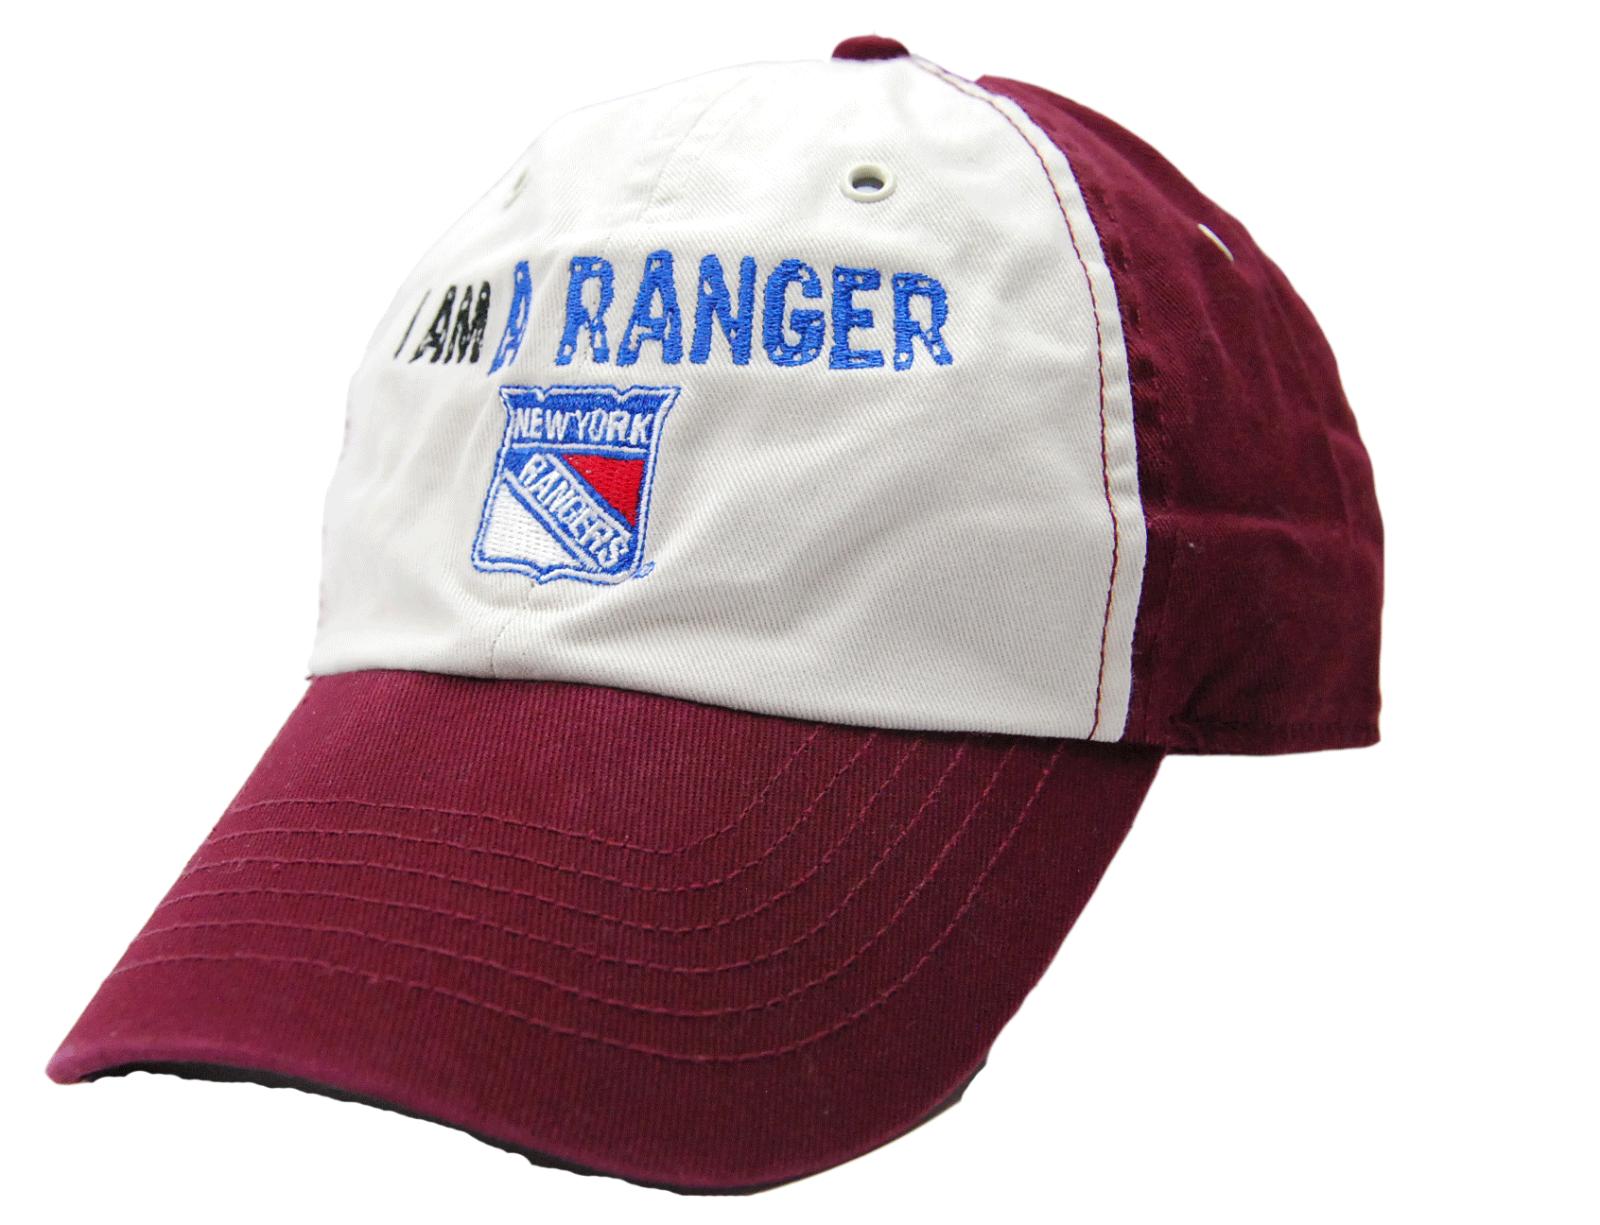 2e979073 New York Rangers Vintage